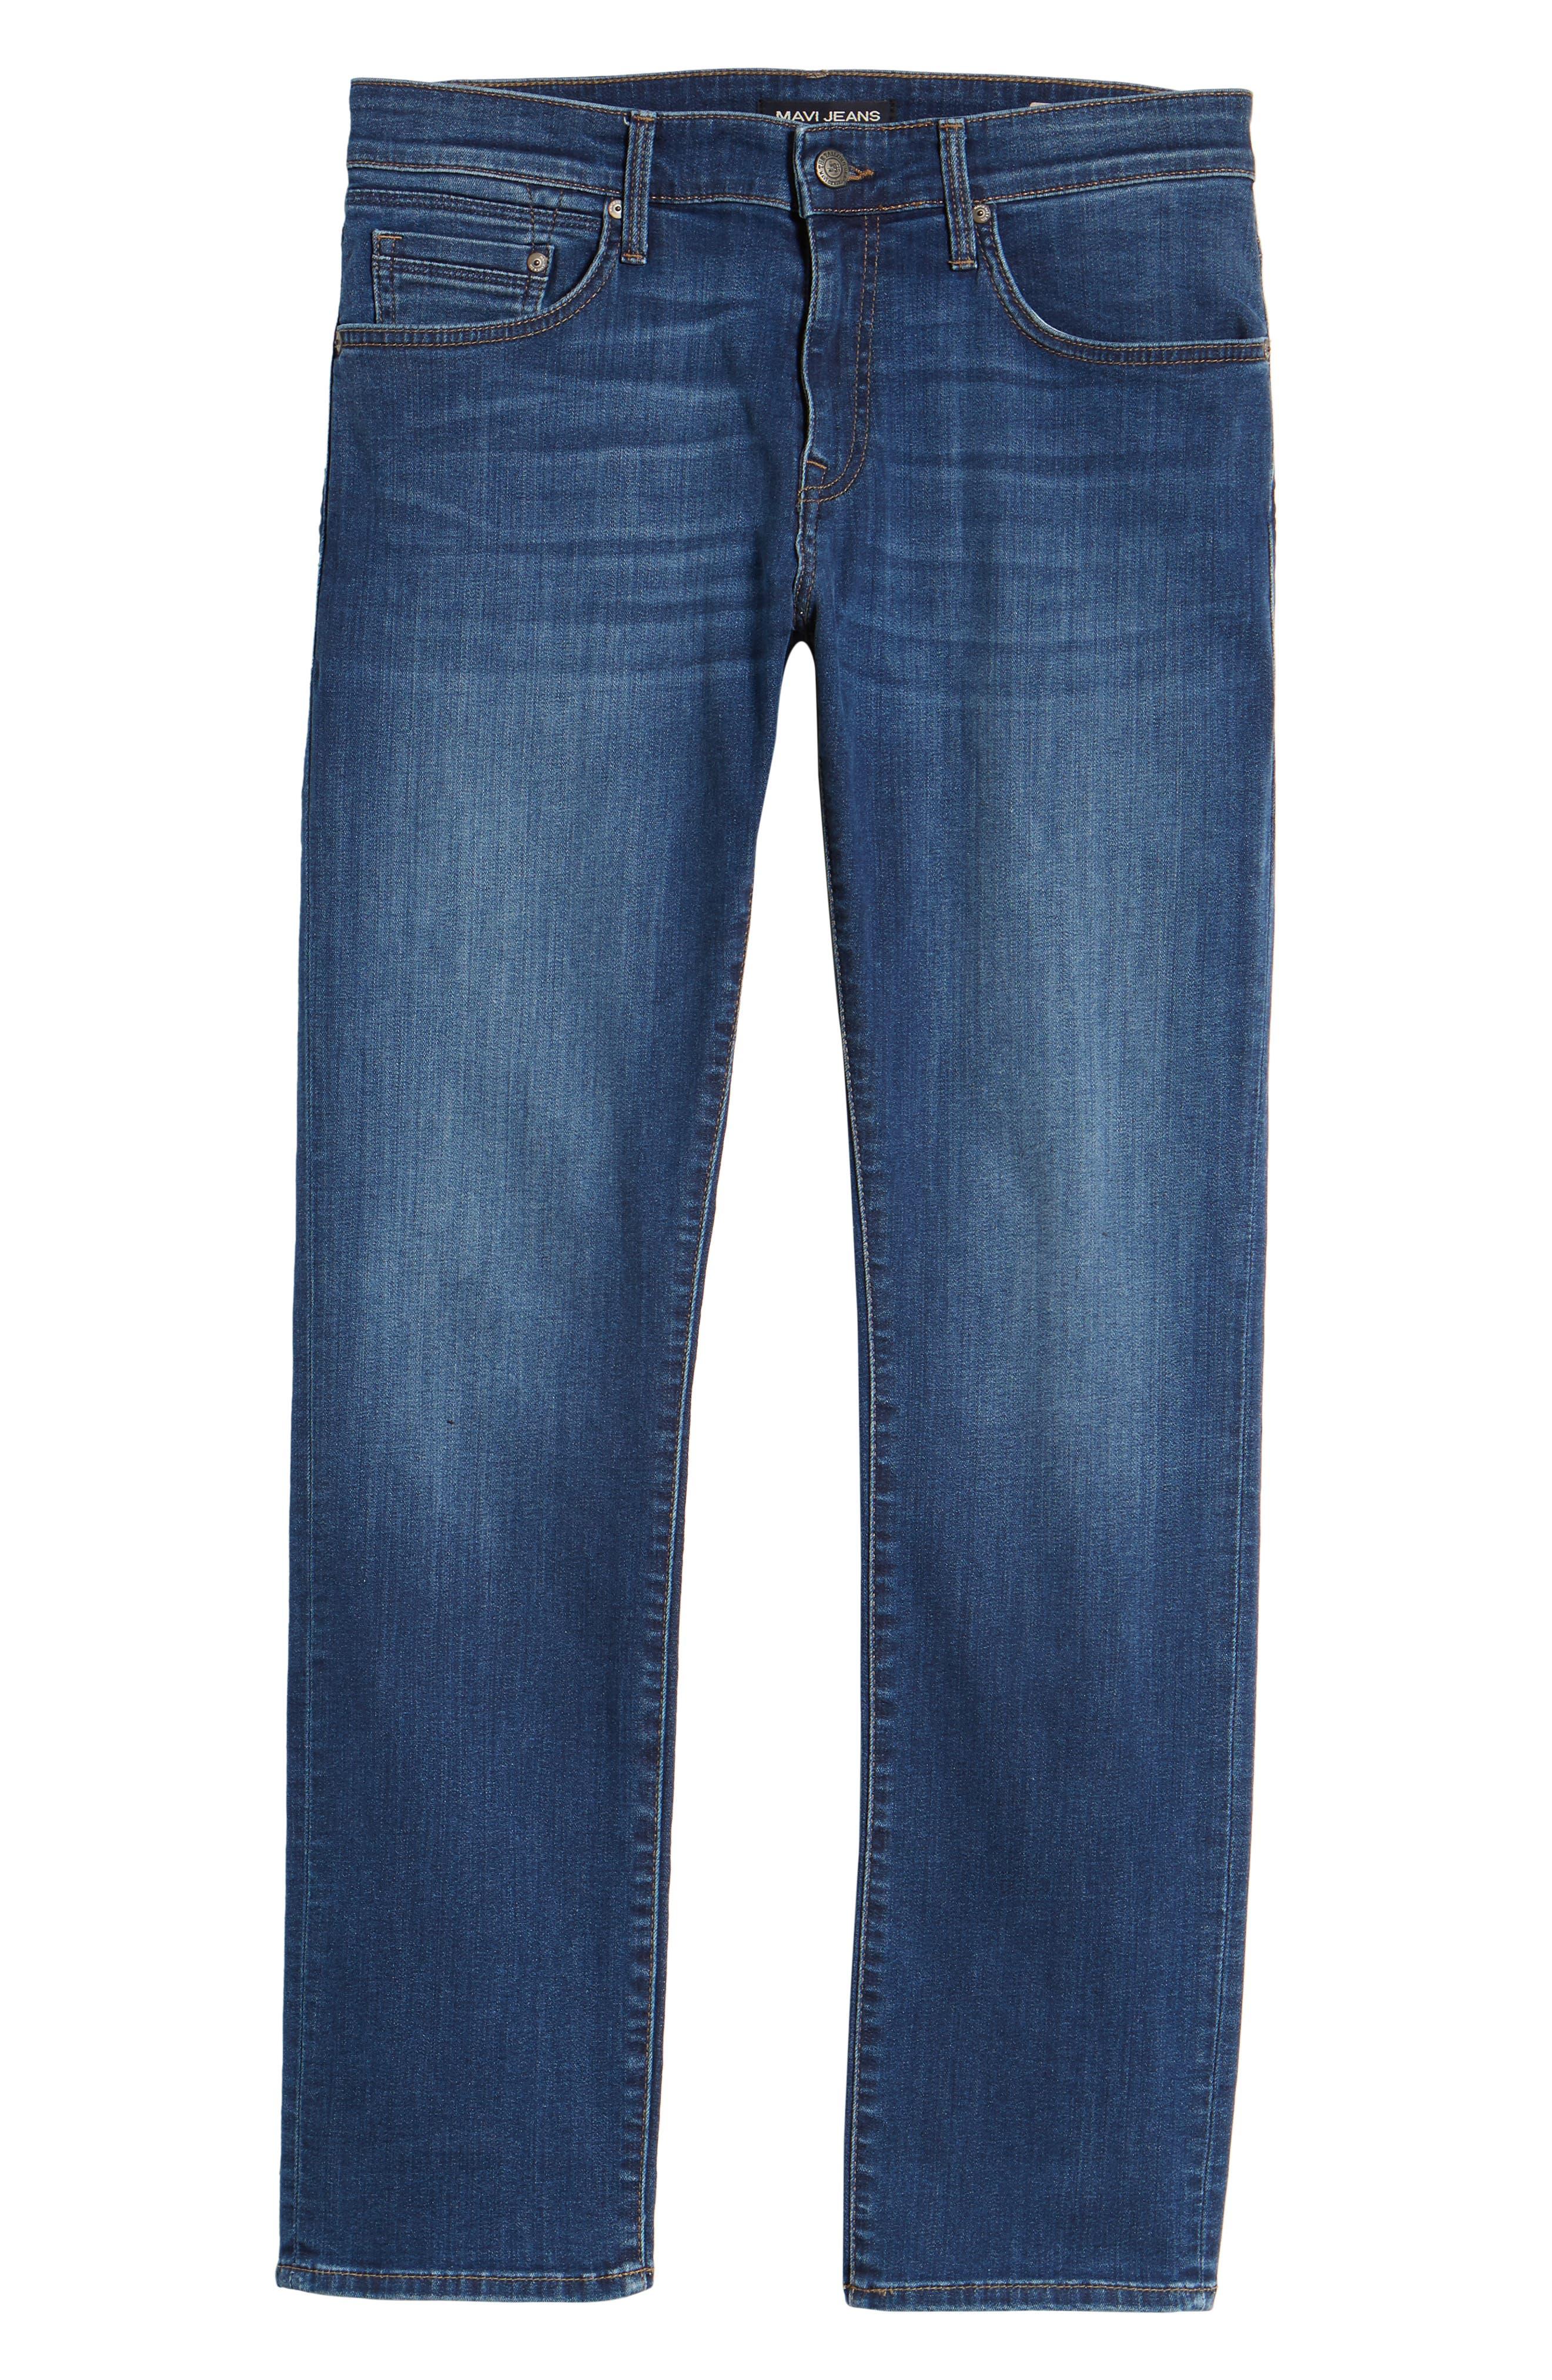 MAVI JEANS, Zach Straight Leg Jeans, Alternate thumbnail 7, color, DARK USED CAPITOL HILL